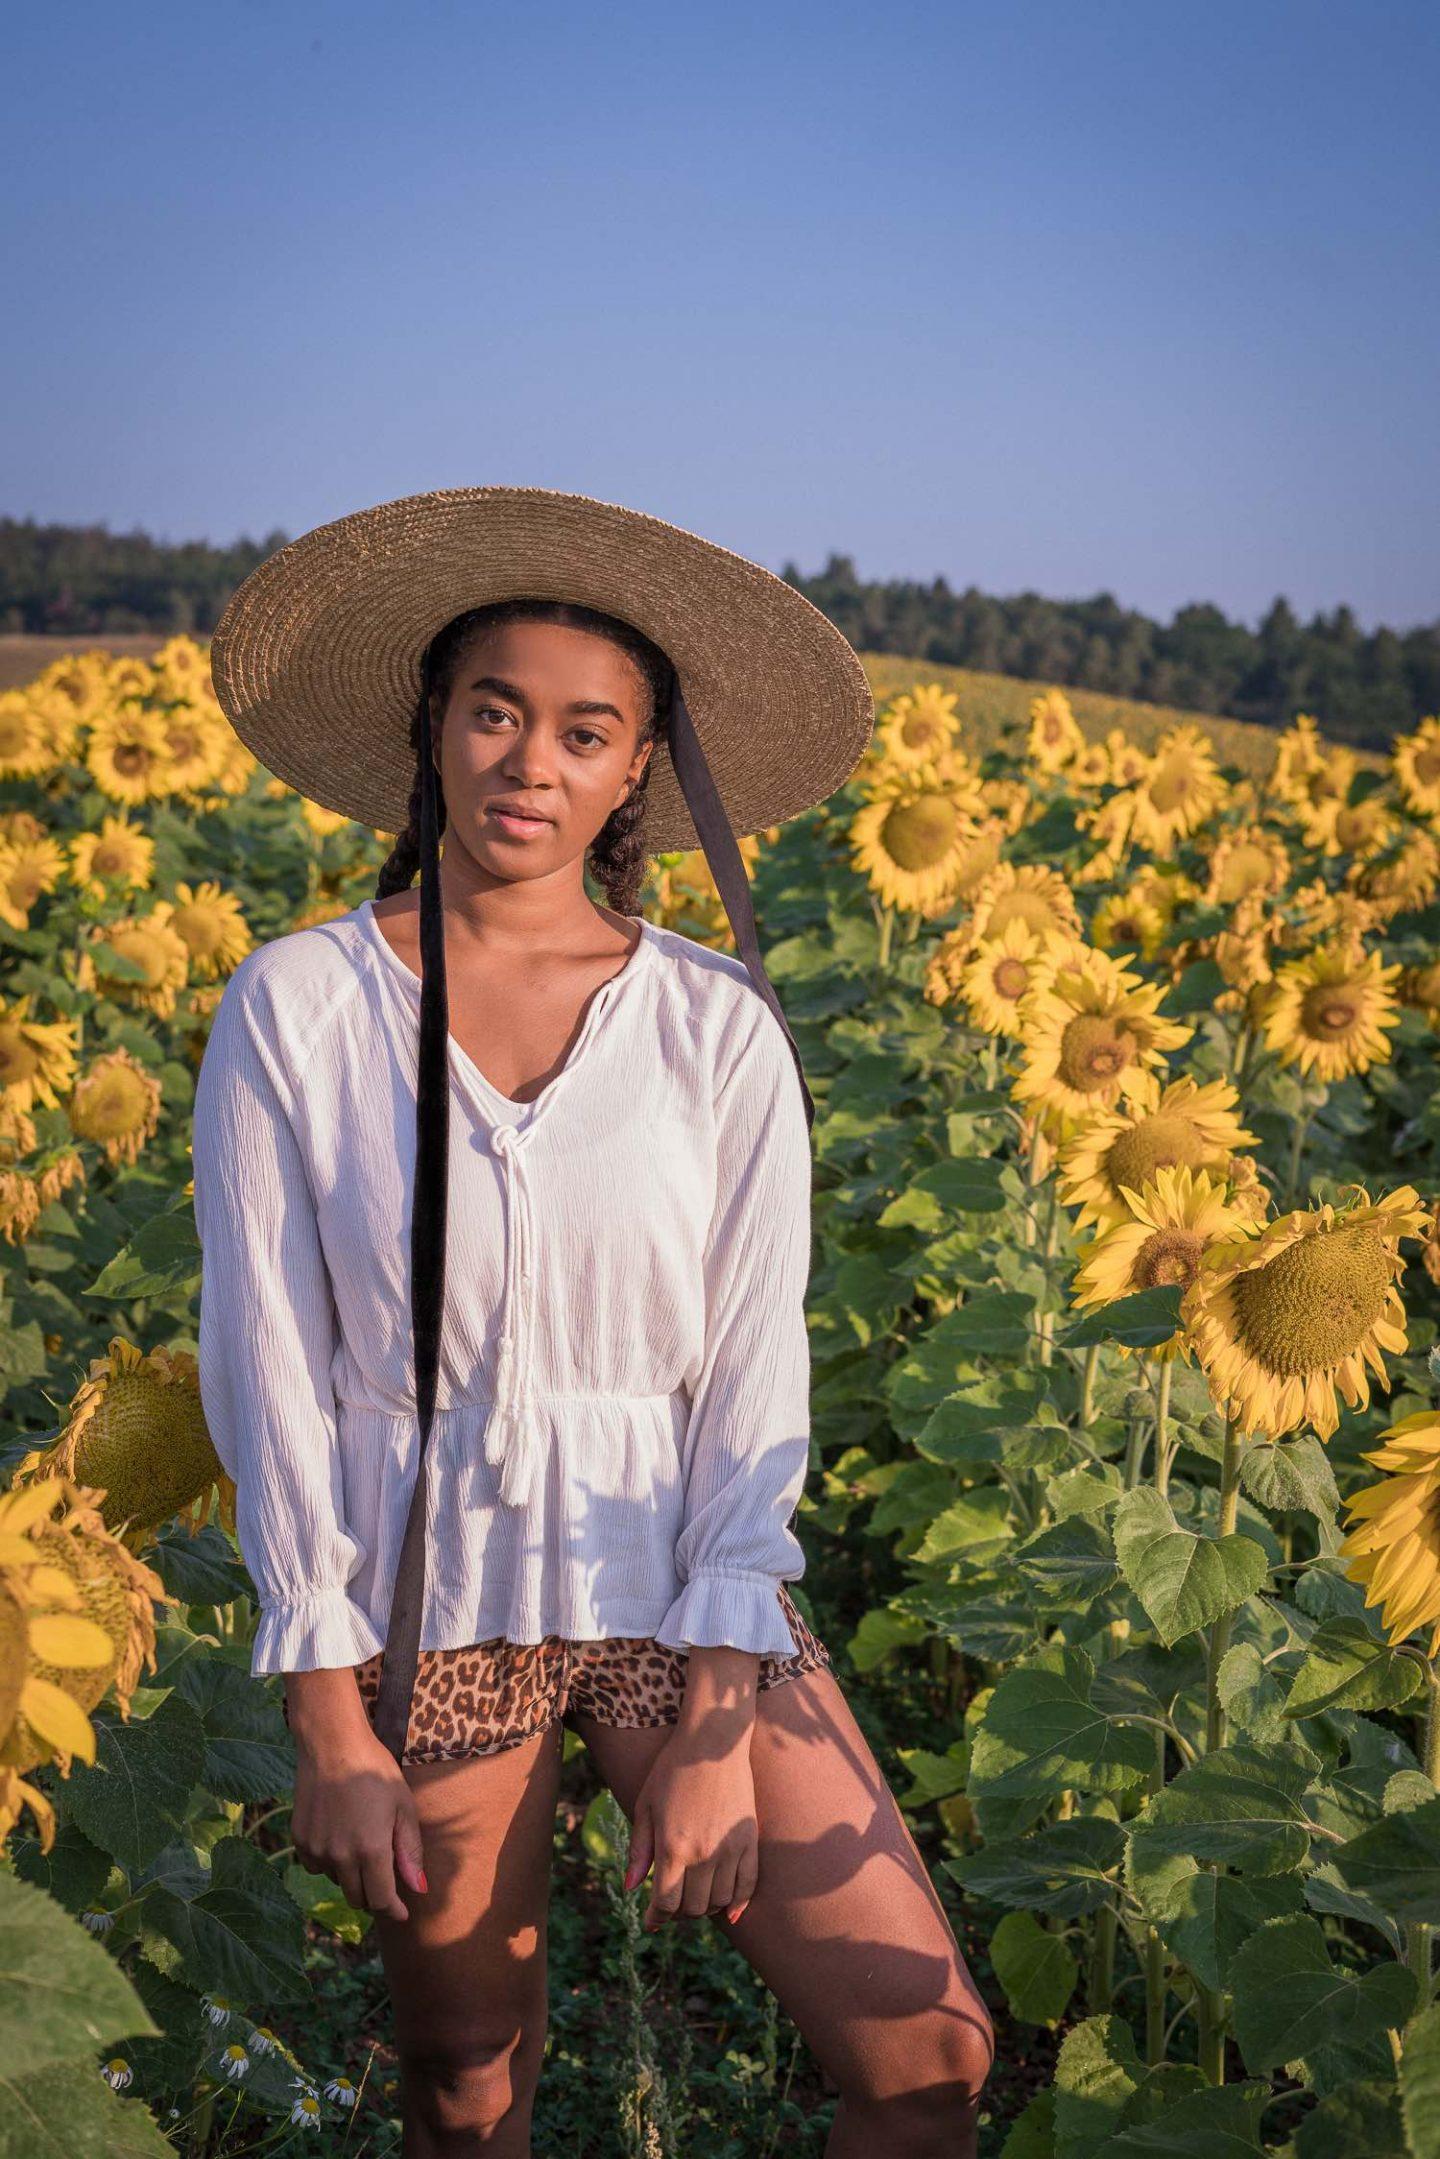 Black Fashion Blogger in a Sunflower Field best summer hats to wear in 2020